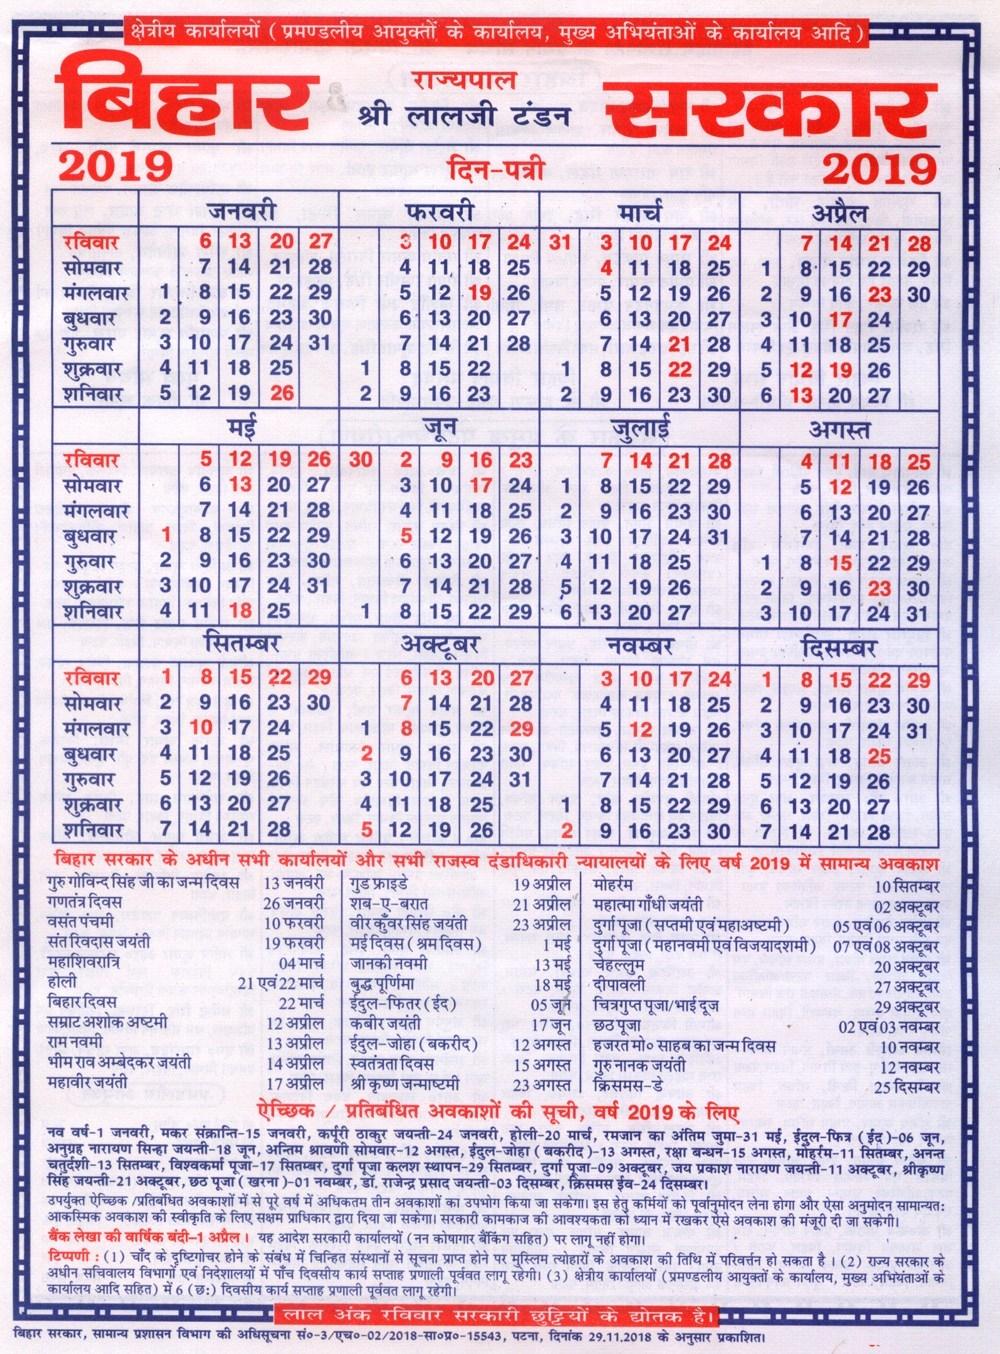 Bihar_Government_Calendar2019 | Bihar School with regard to 2020 Calendar Bihar